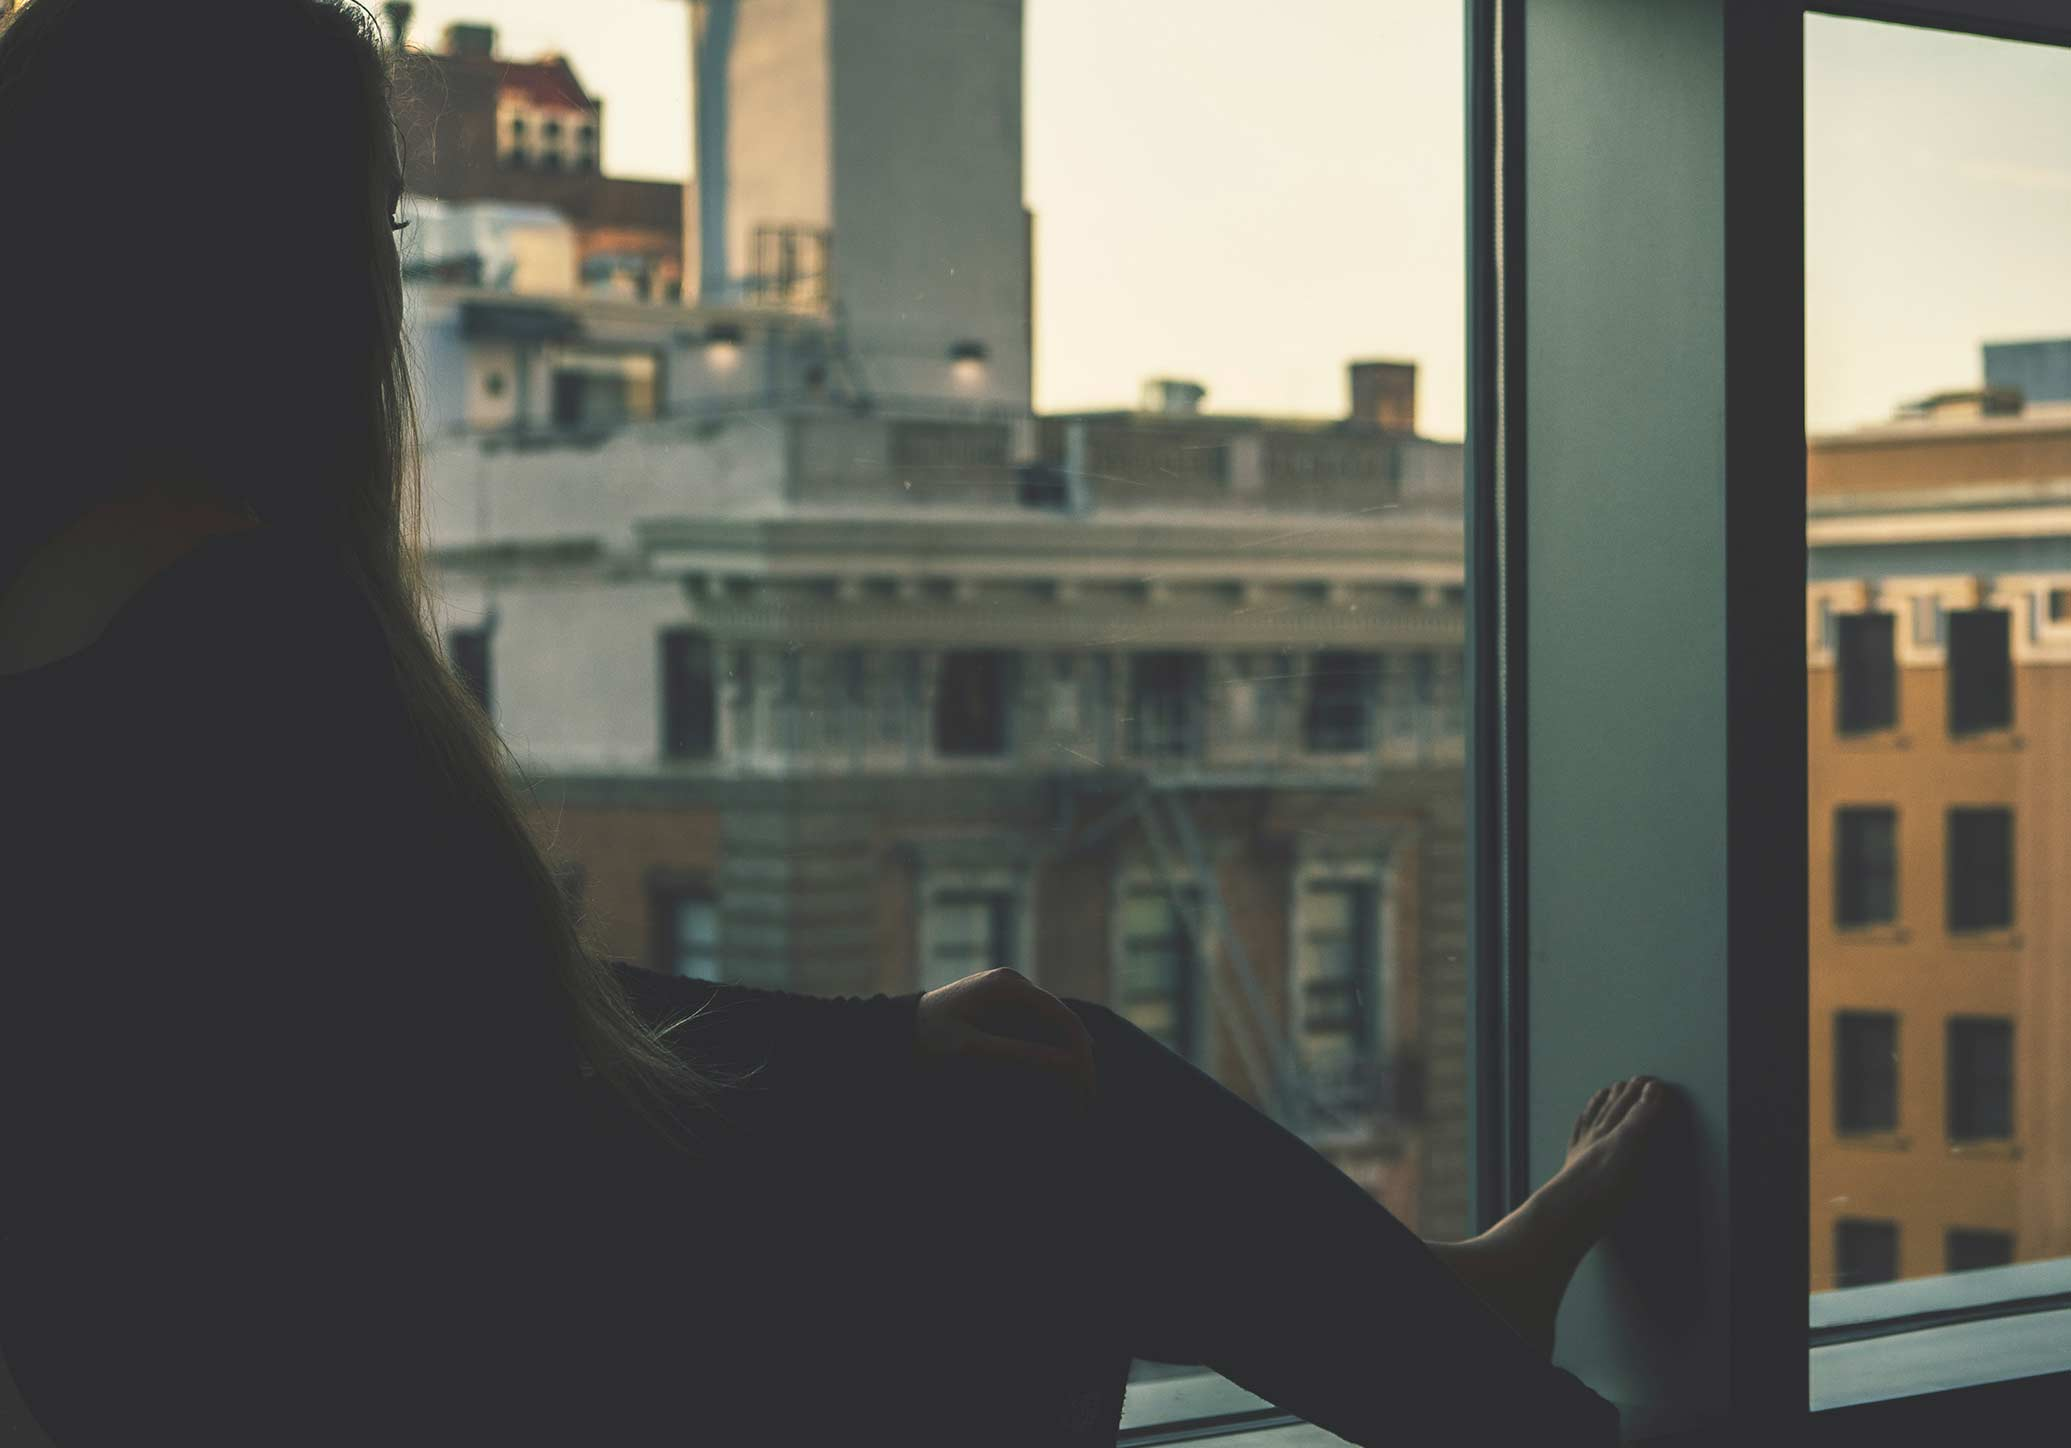 Guia para cuidar a saúde mental durante o confinamento